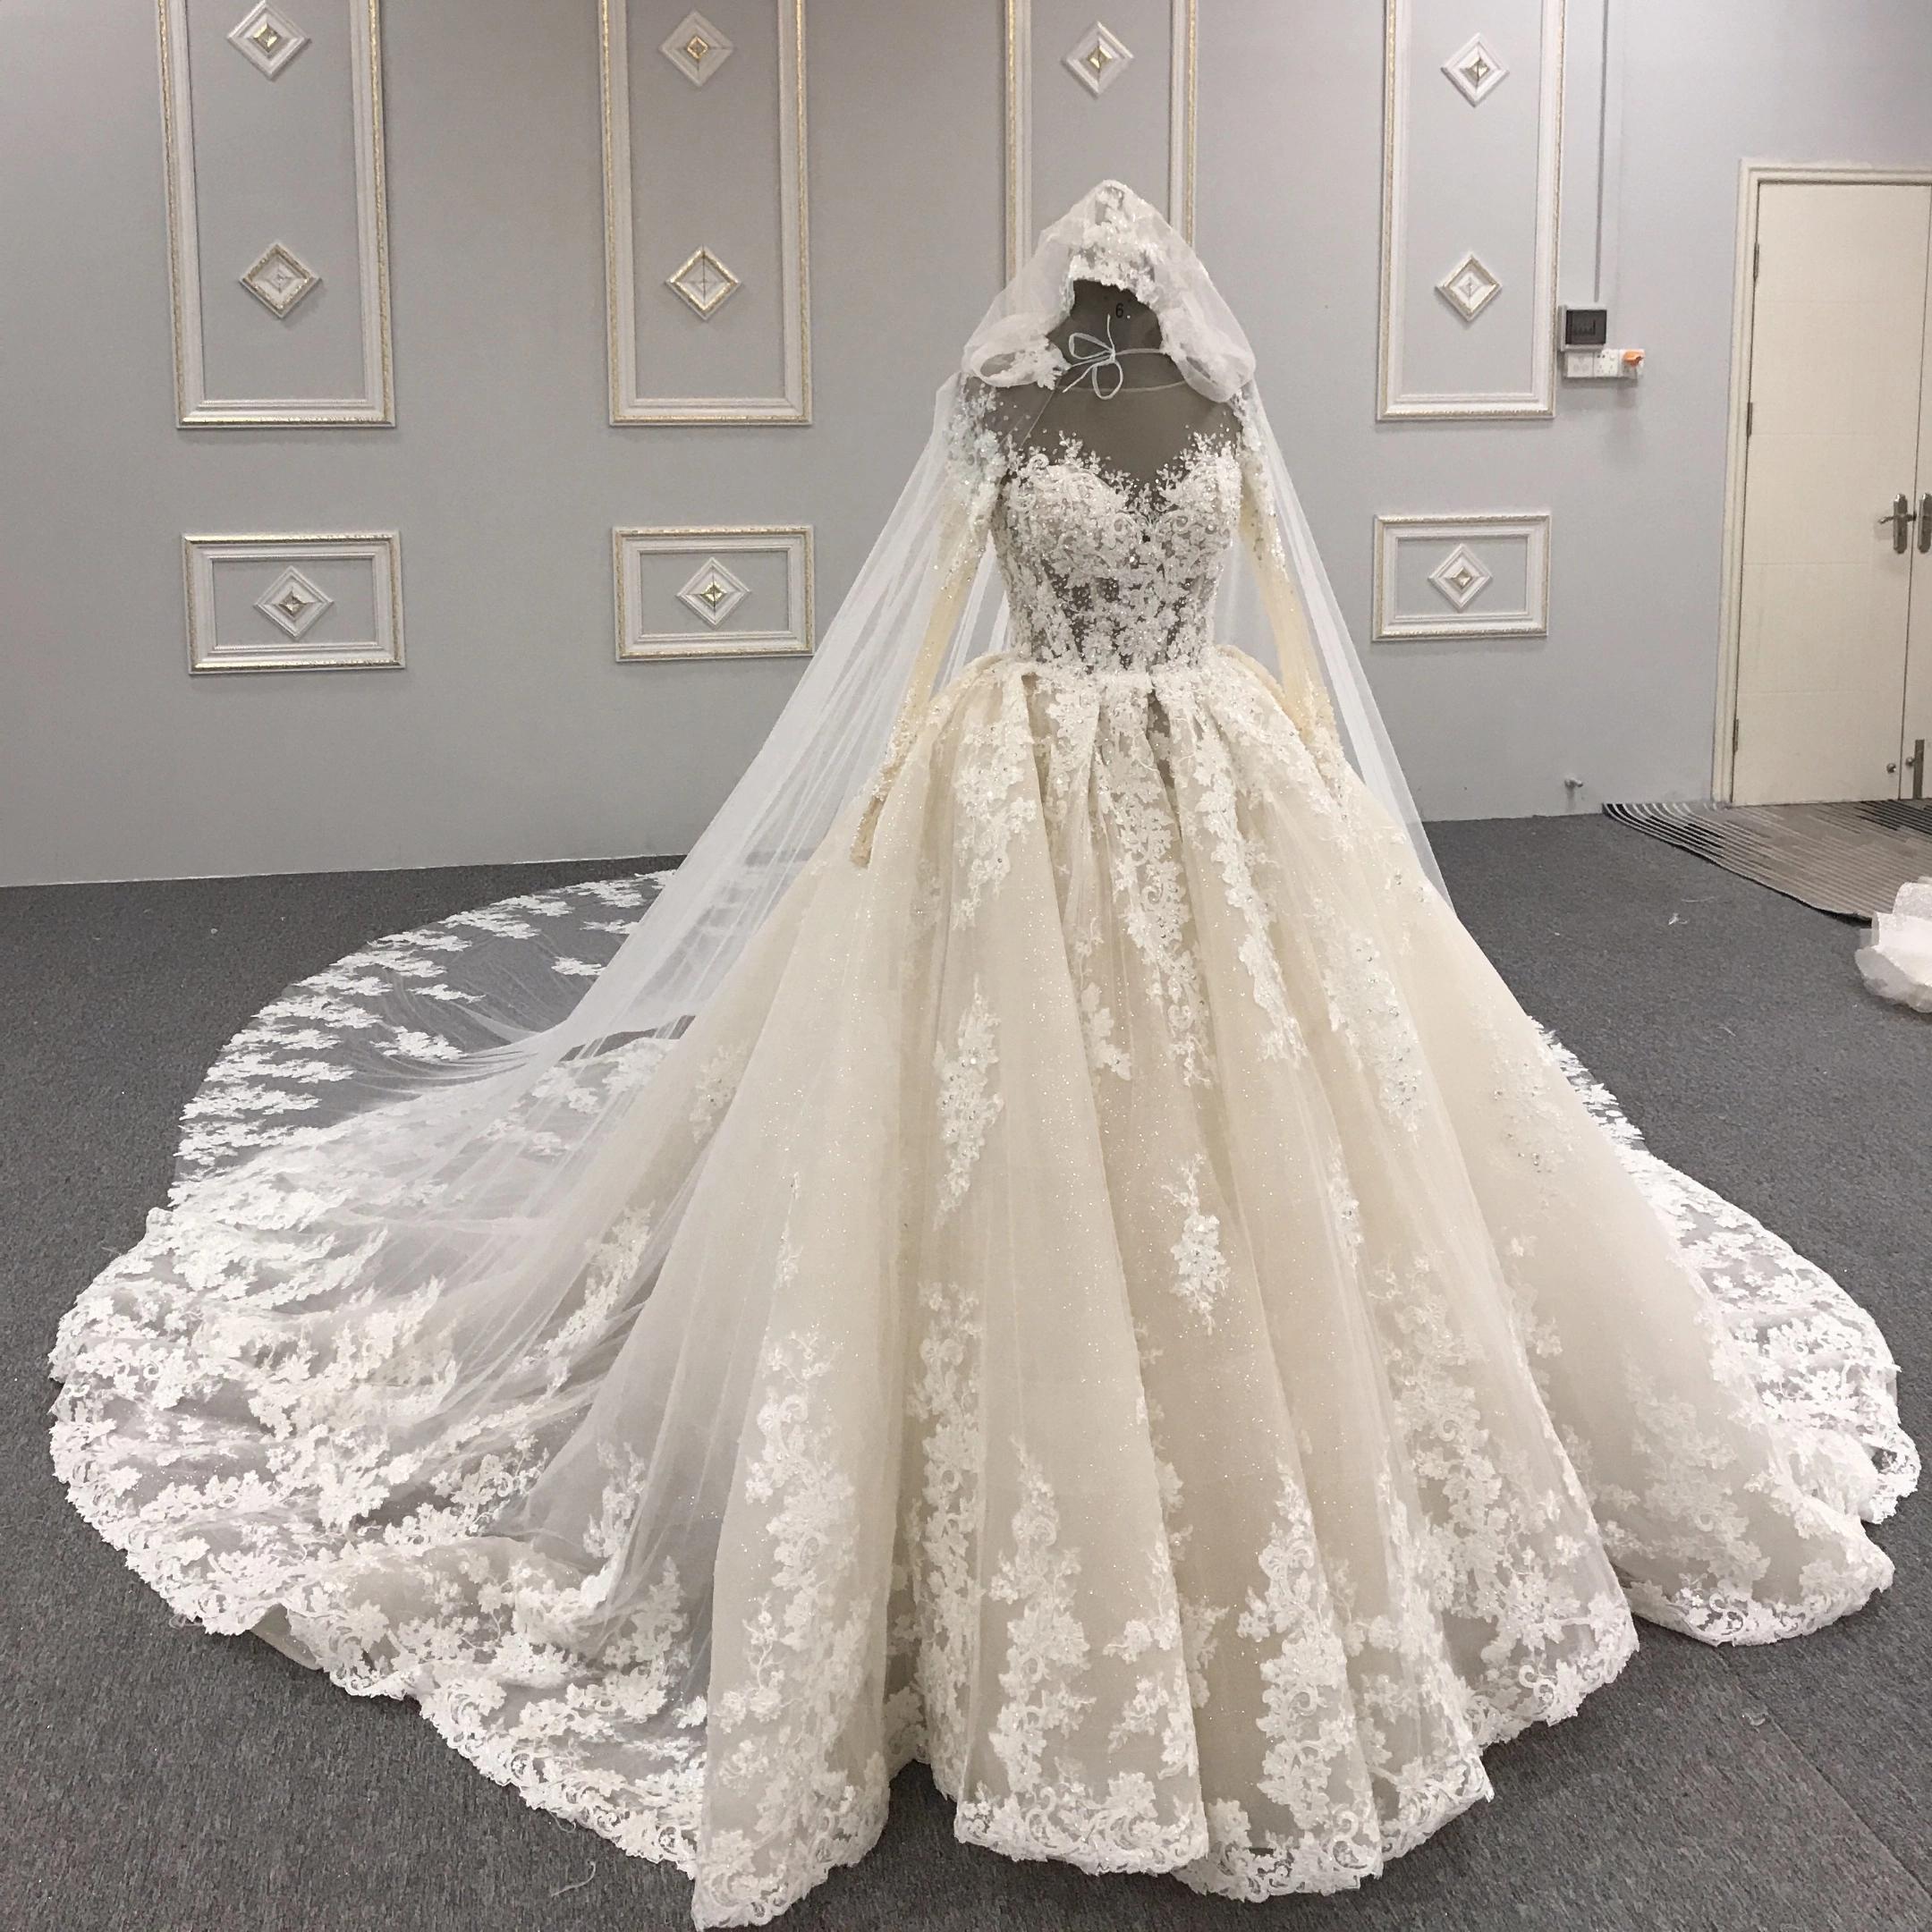 Echtes Foto 2021 Spitze Brautkleider Wunderschöne Bling Bling Kristall Lange Ärmel Dubai Brautkleider Appliqued v Zurück Vor langer Gericht Zug Royal